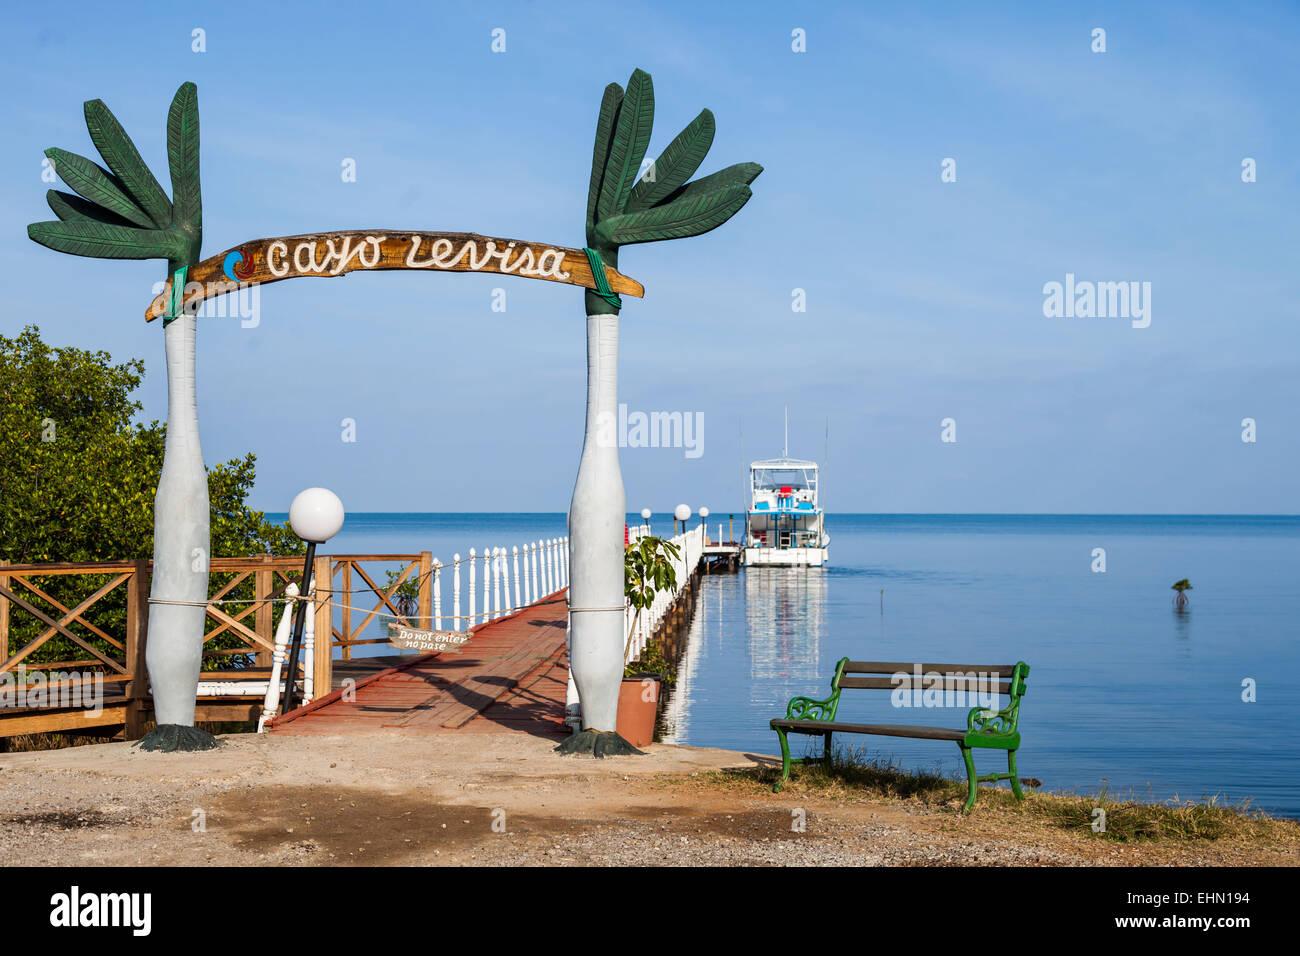 Pontoon to go to Cayo Levisa, Cuba. - Stock Image